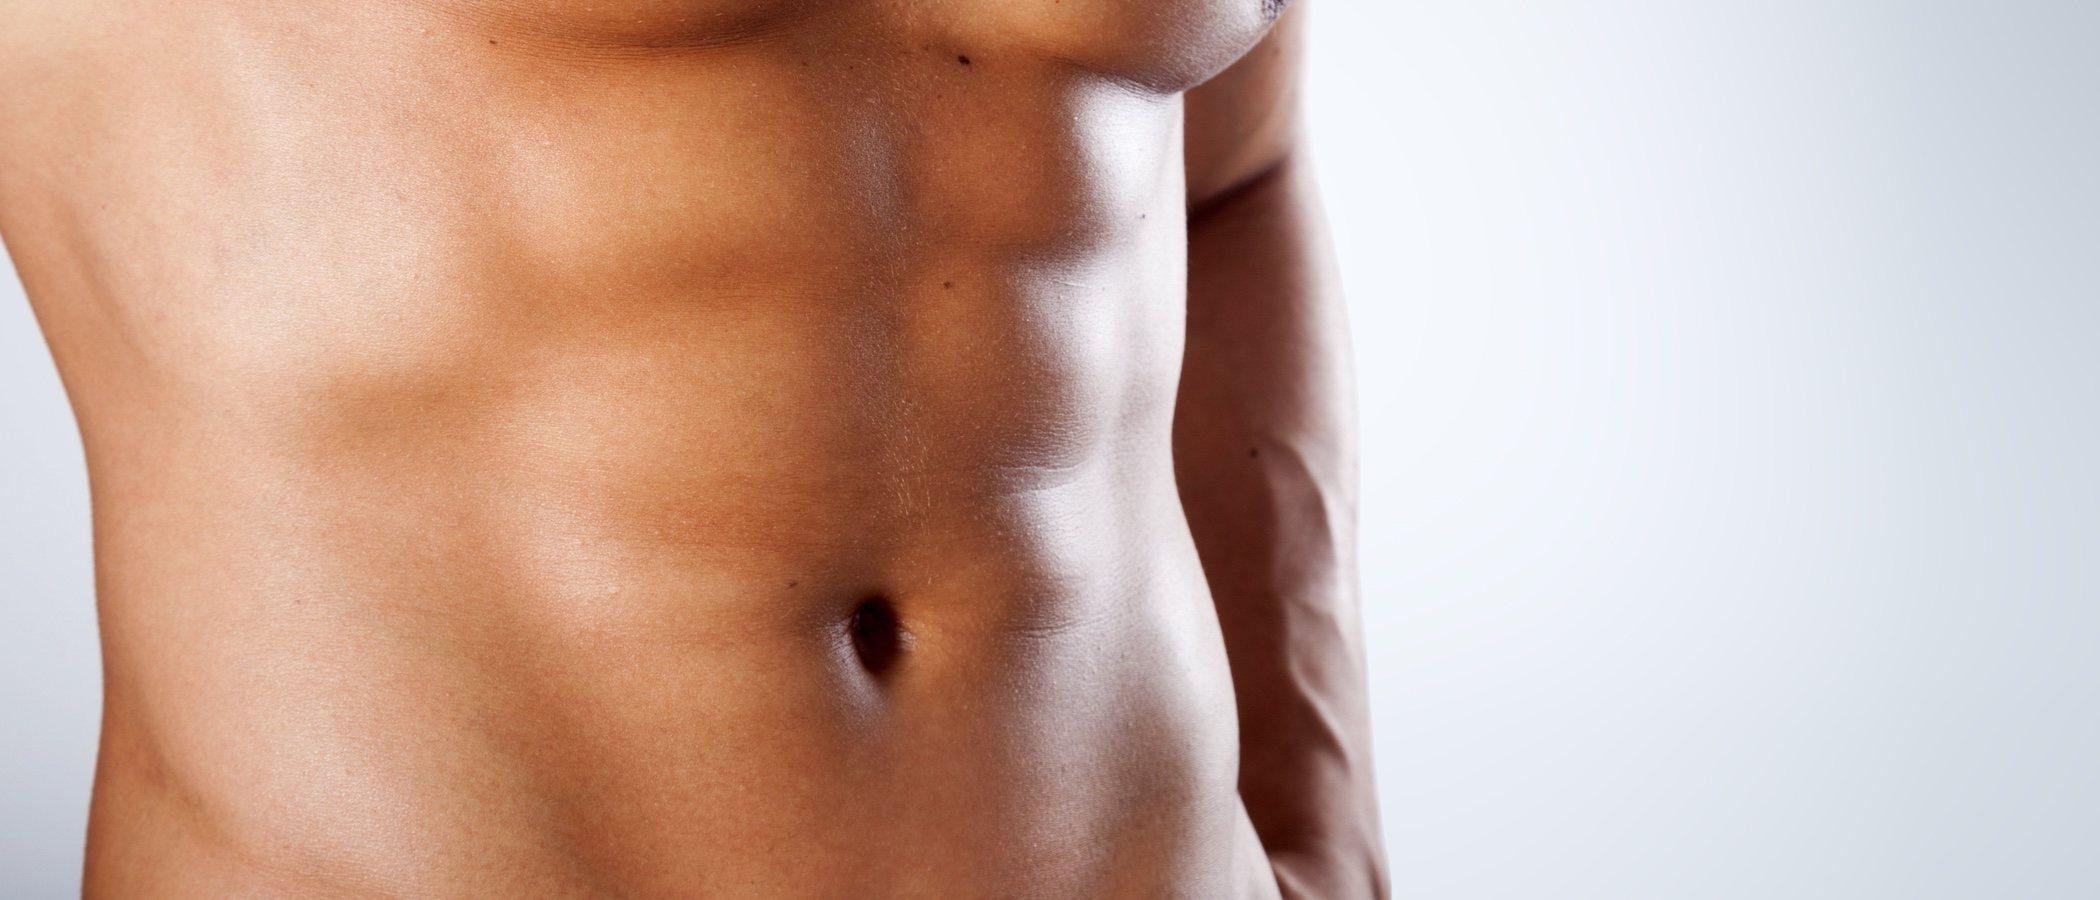 Abdominales masculinos: Consejos para conseguir 'six pack'